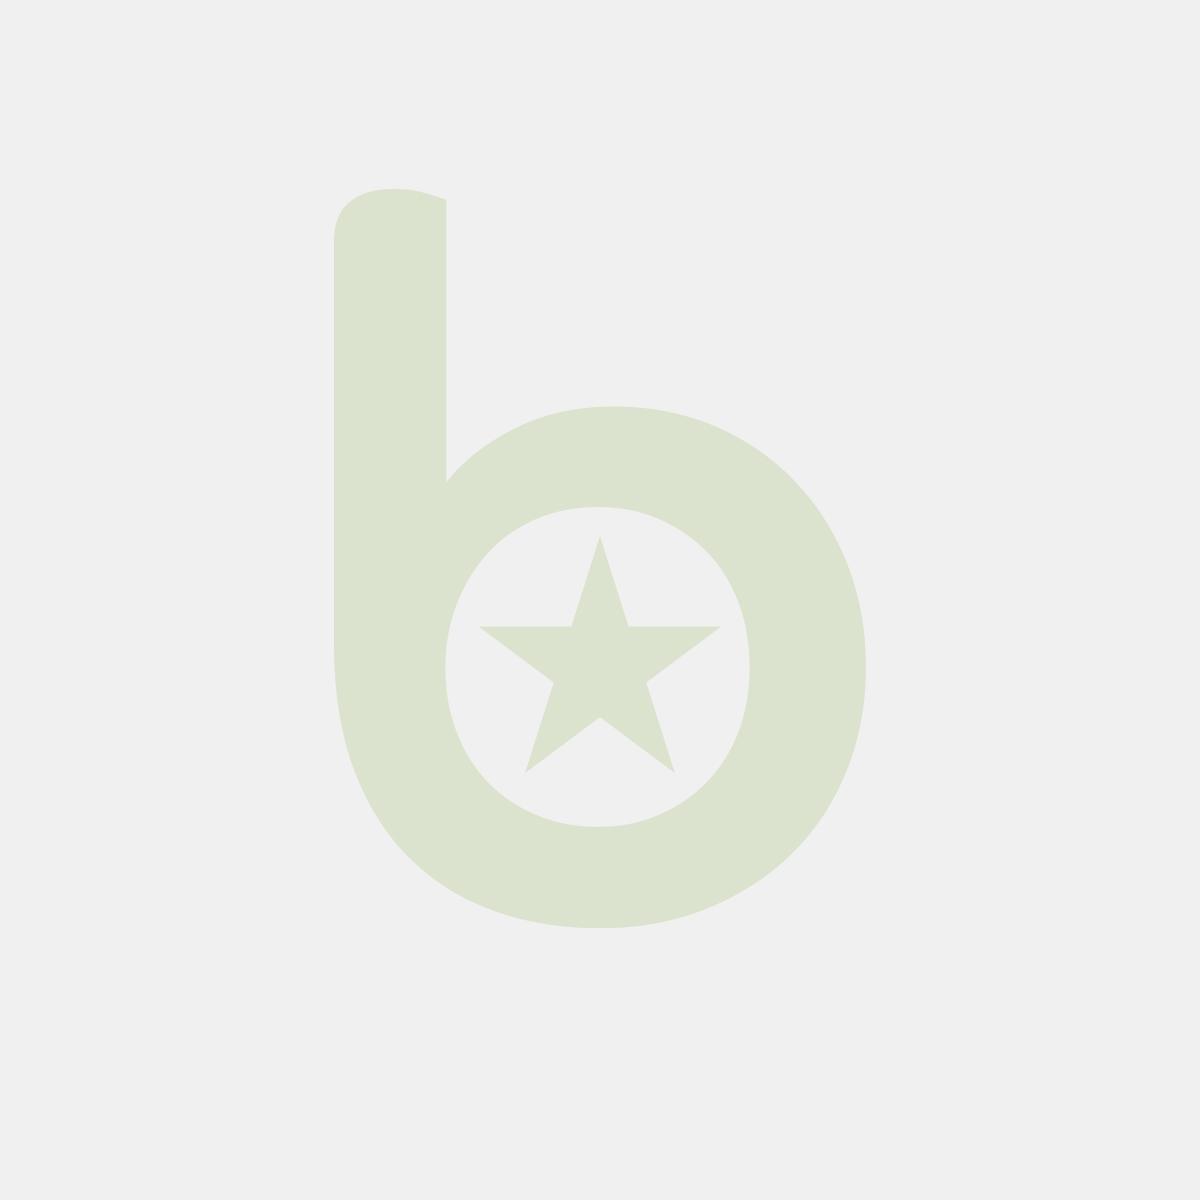 Tacka styropianowa żółta nr 73 (225x138x17mm), cena za 800 sztuk